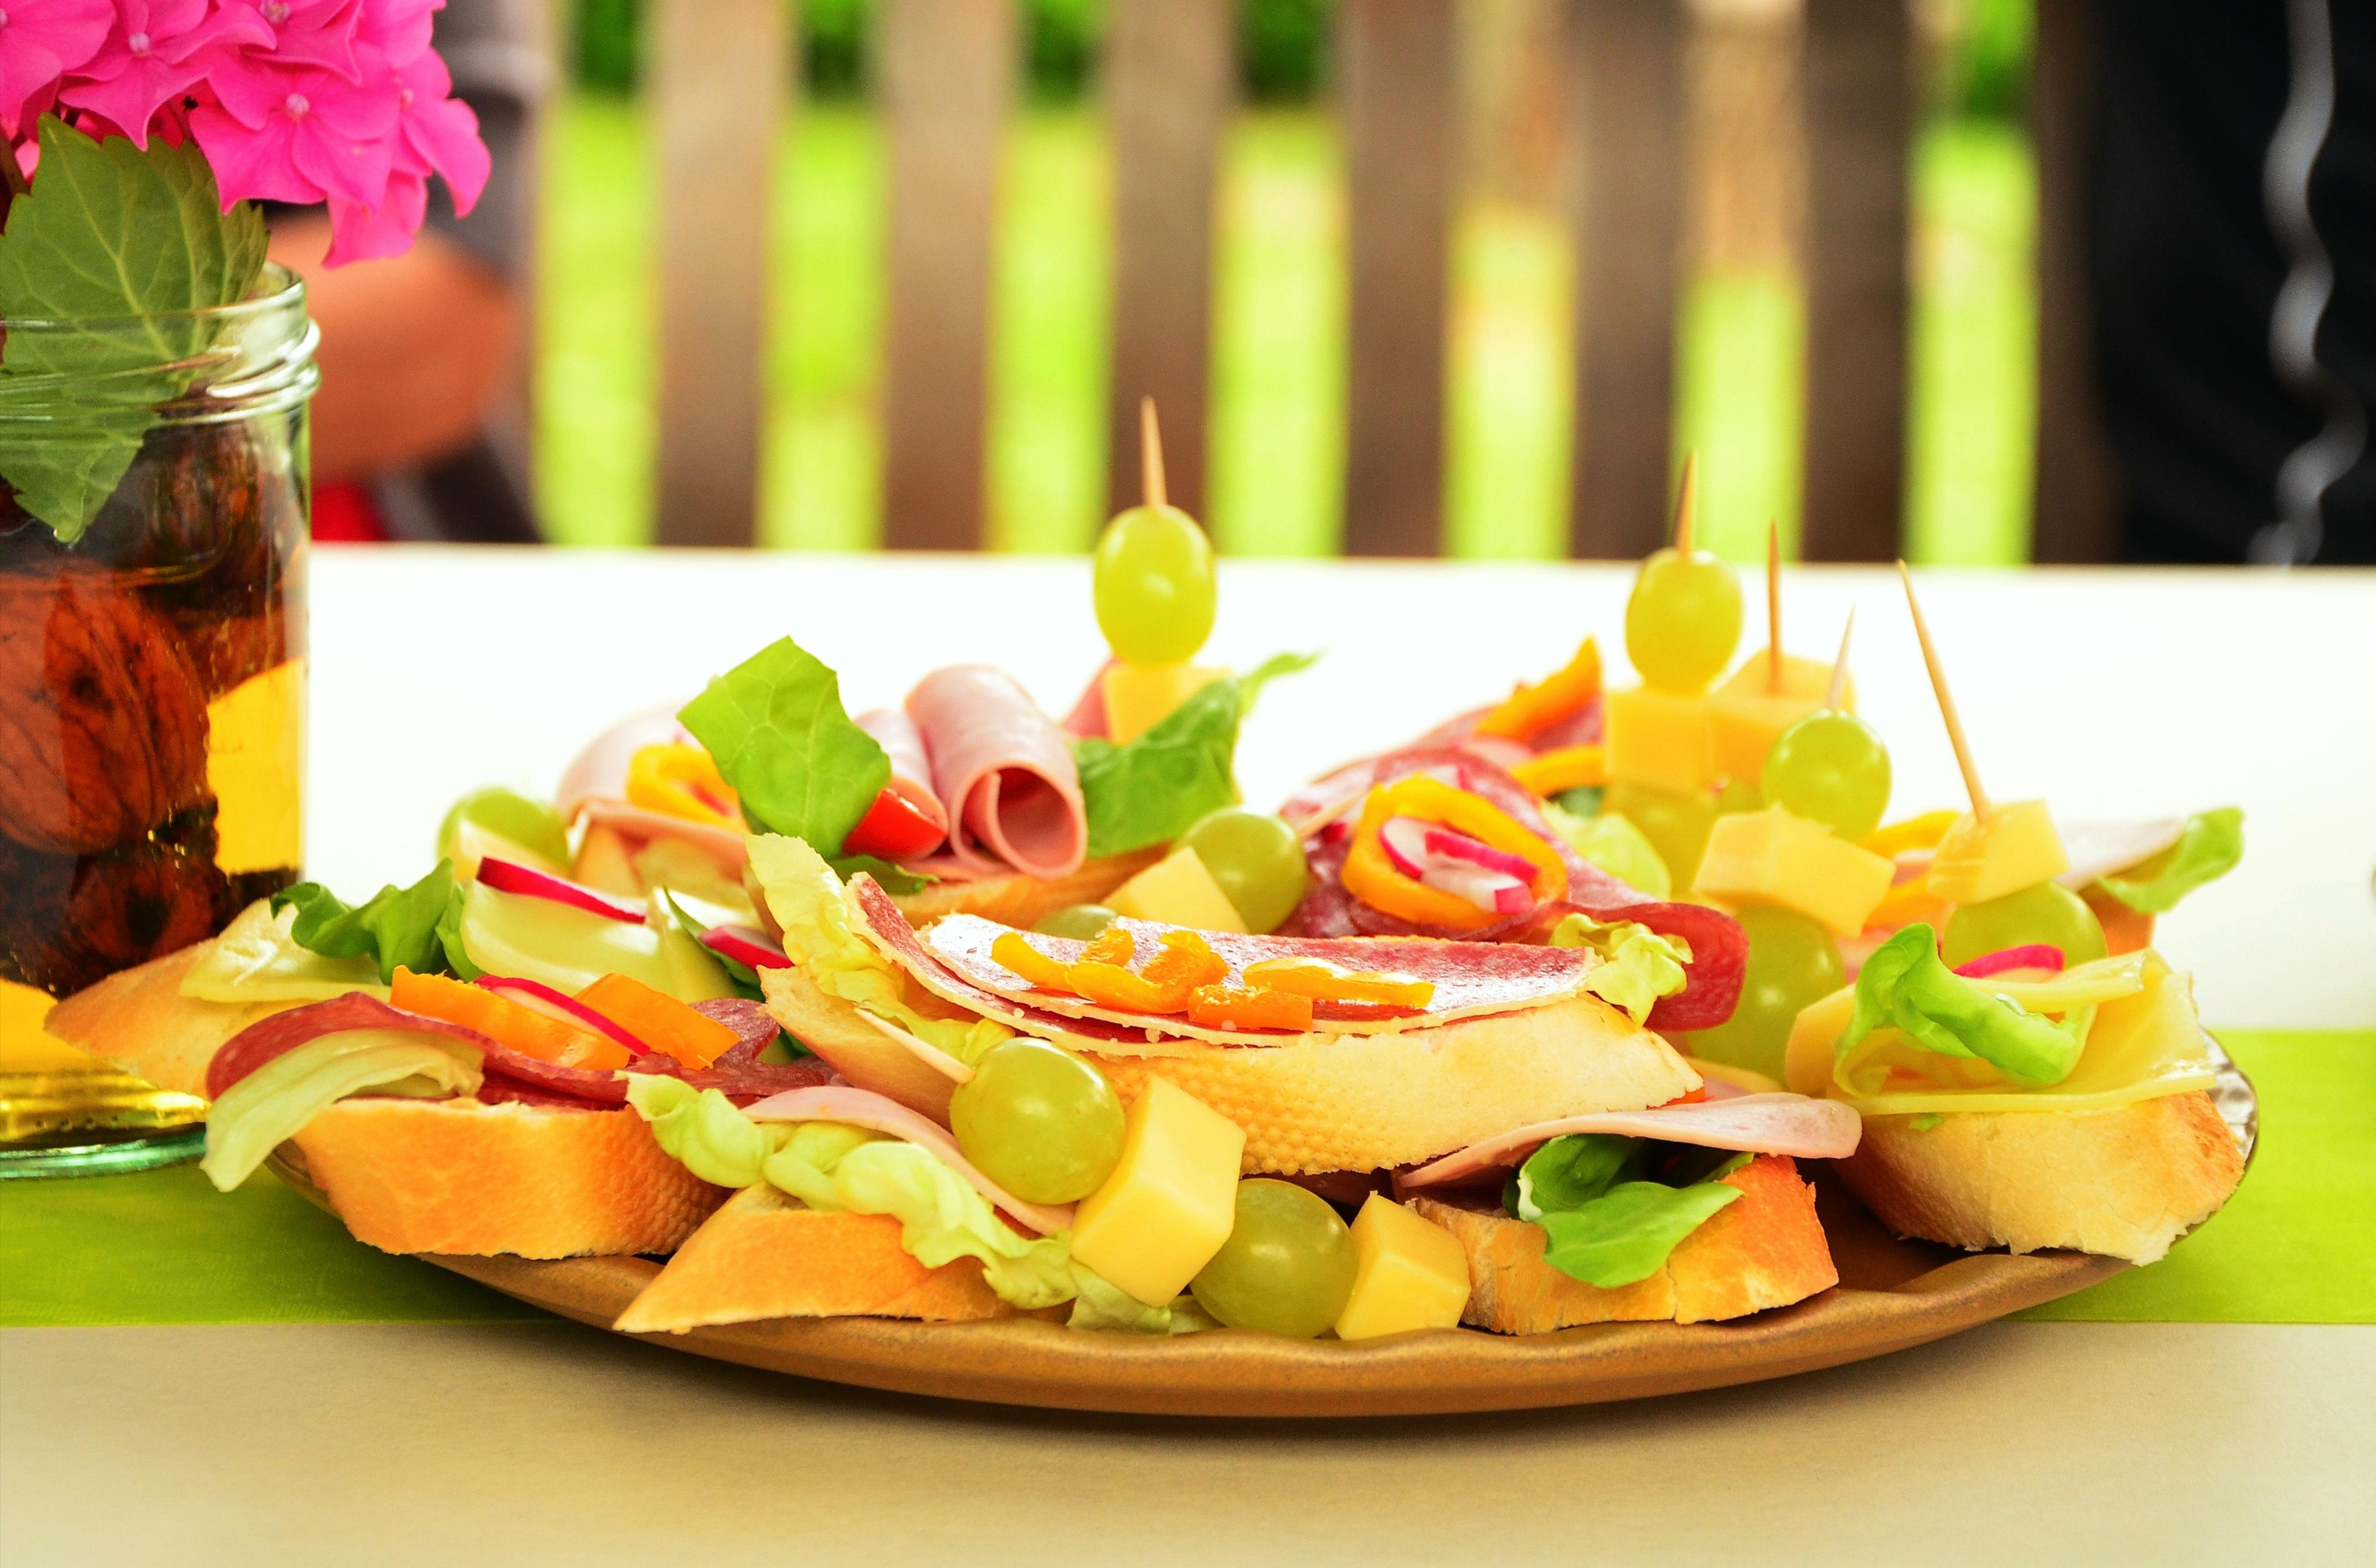 Kostenlose Foto Gericht Mahlzeit Lebensmittel Salat